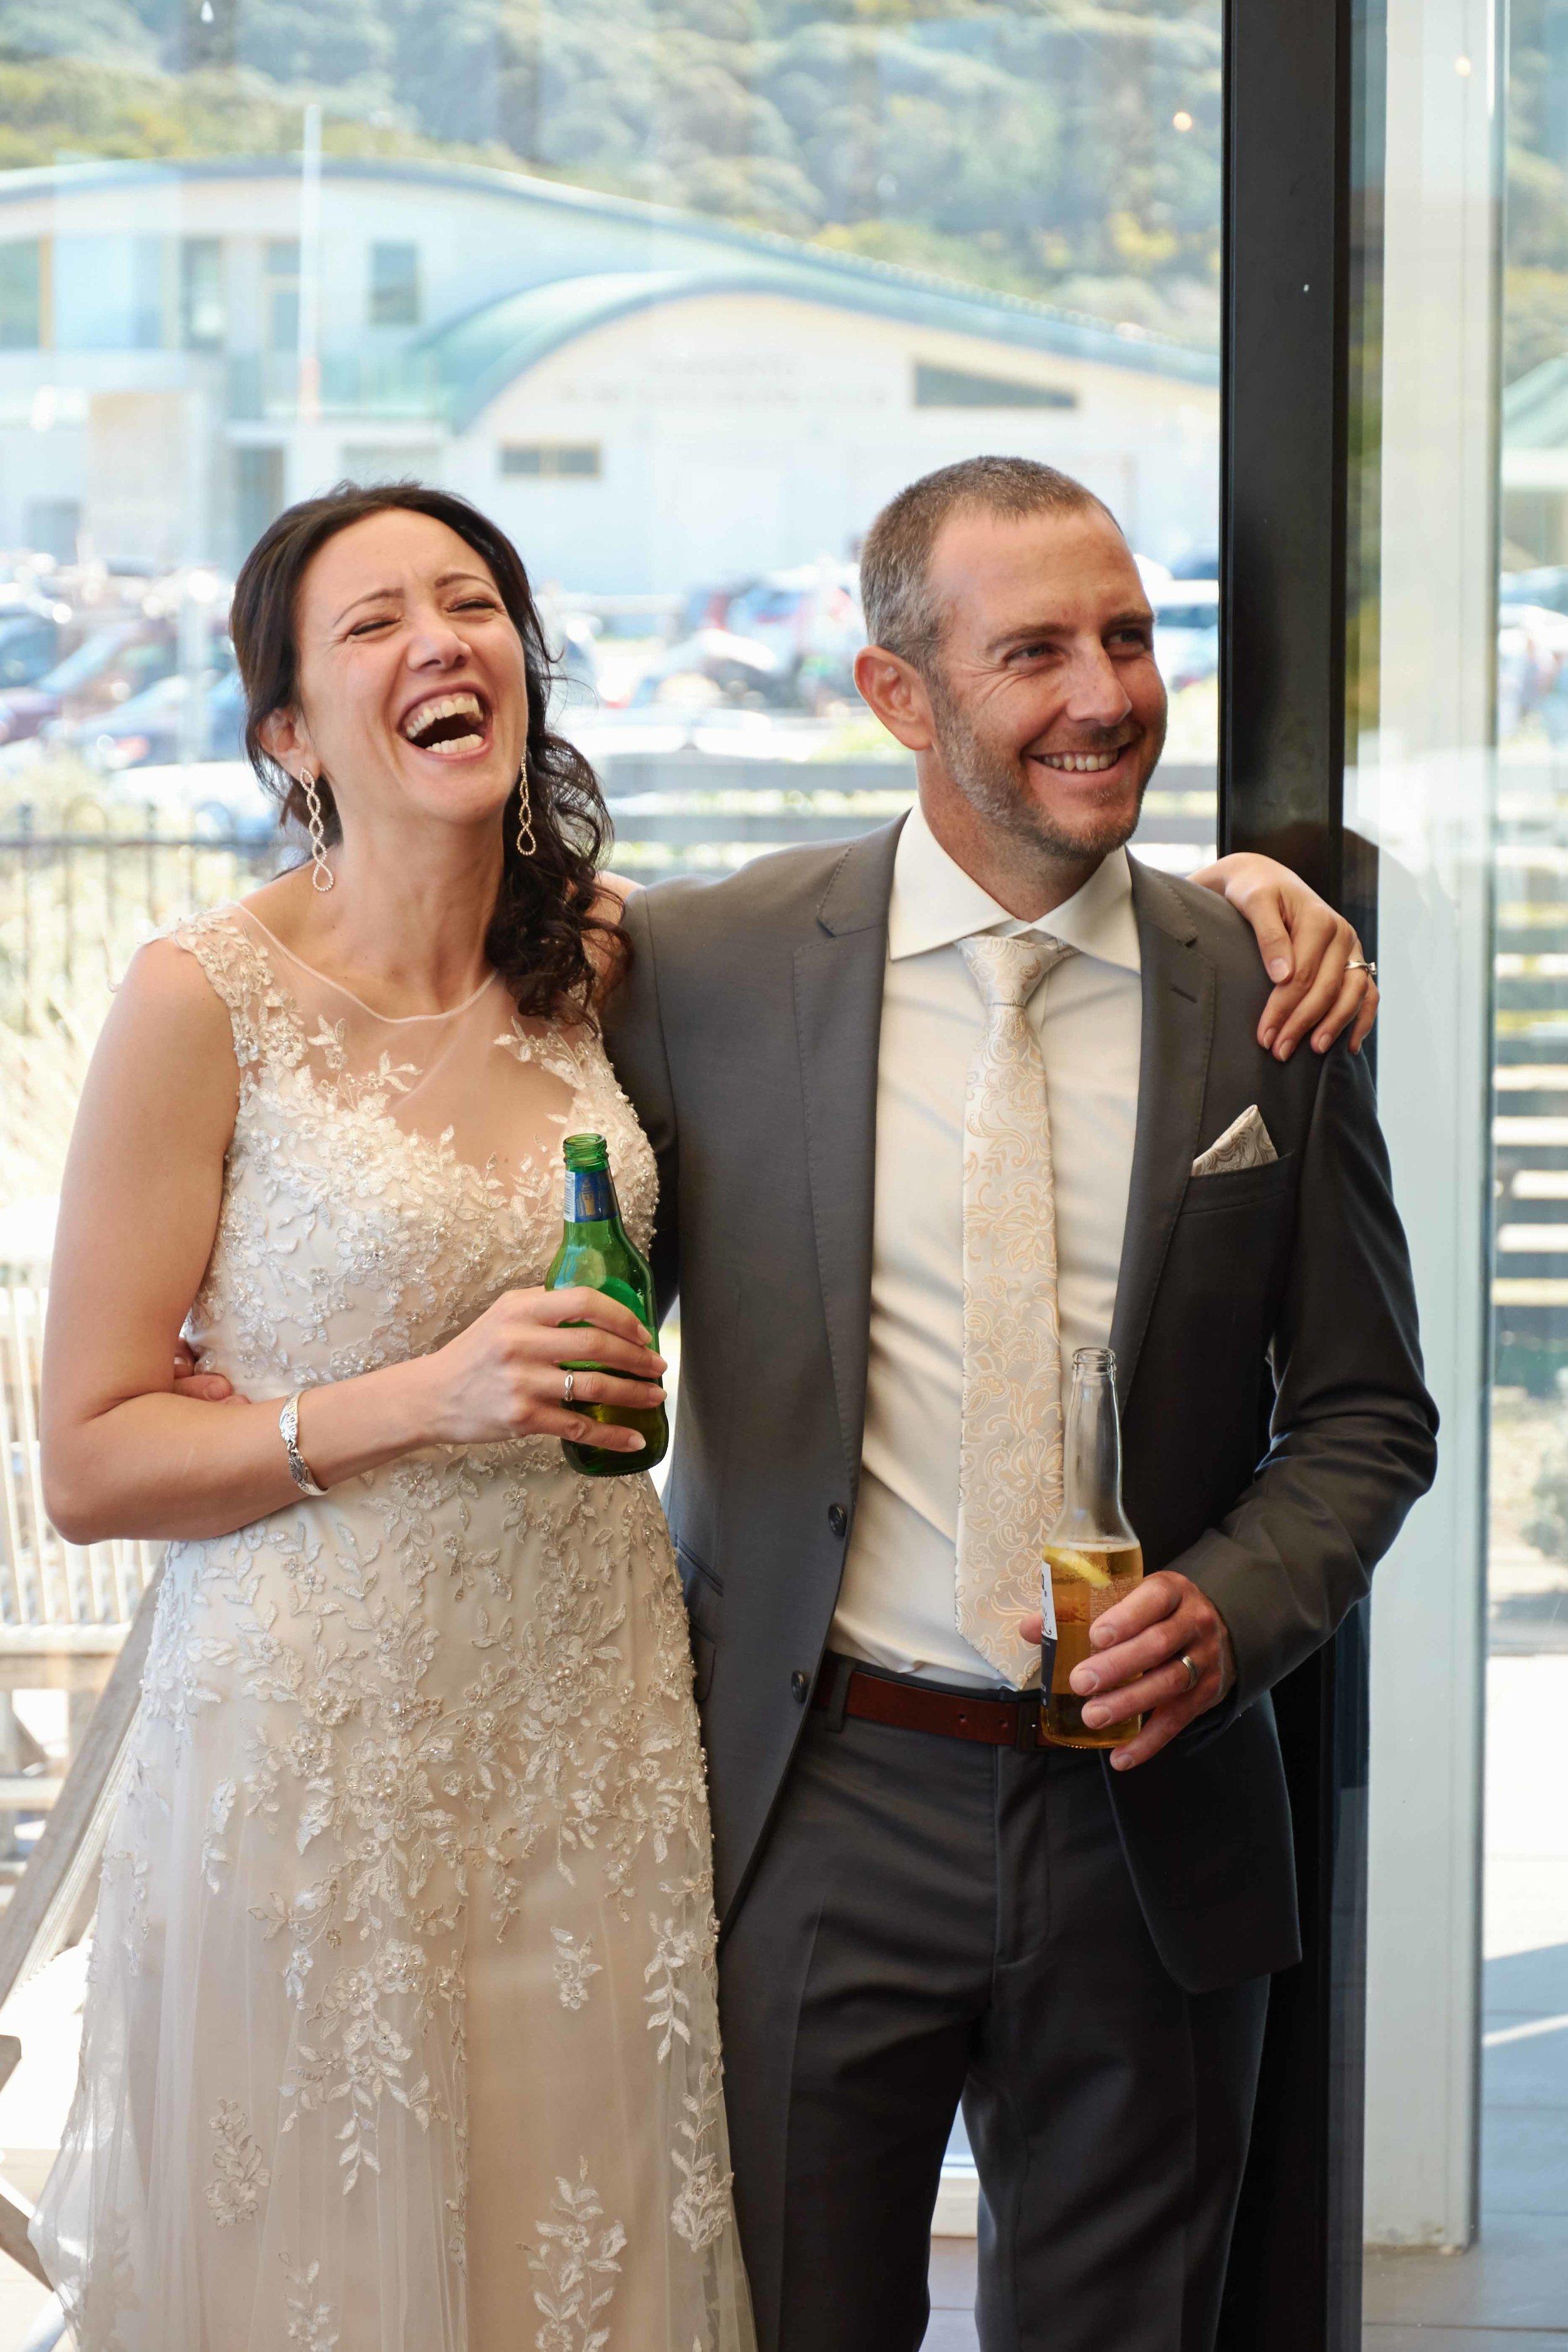 sorrento-wedding-photography-all-smiles-marissa-jade-photography-90.jpg